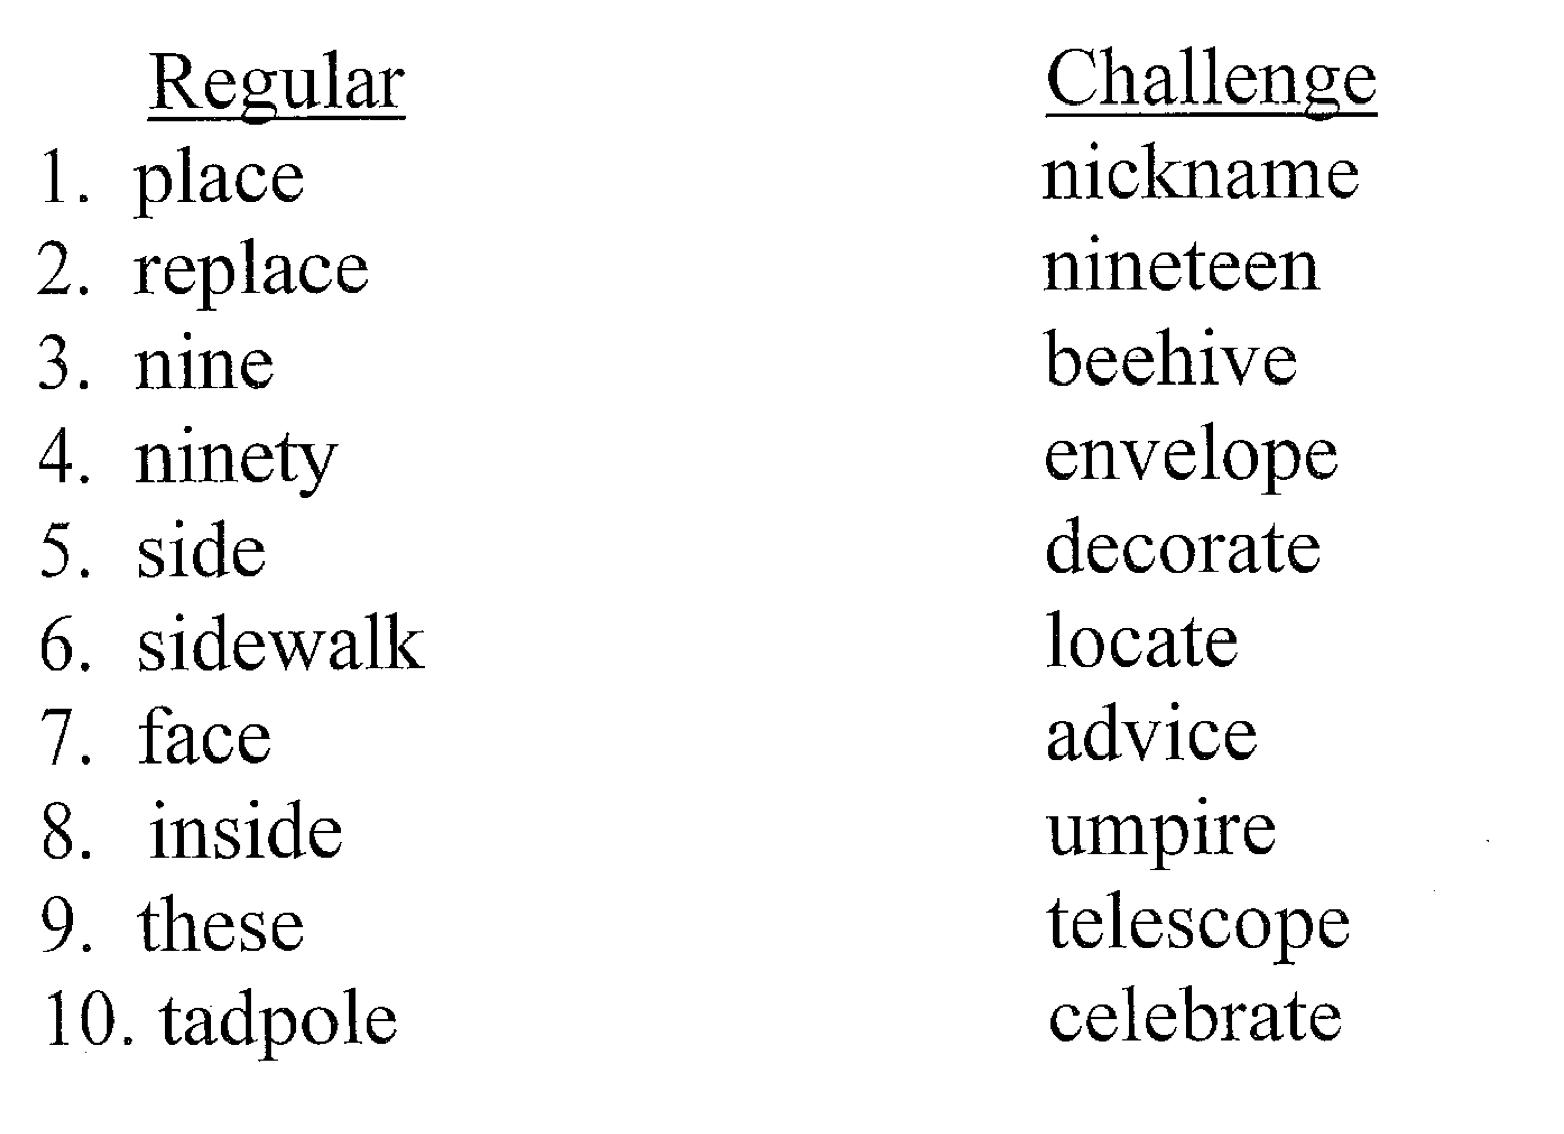 worksheet Second Grade Spelling Words similiar 10 spelling words for 2nd graders keywords grade information second homework and words